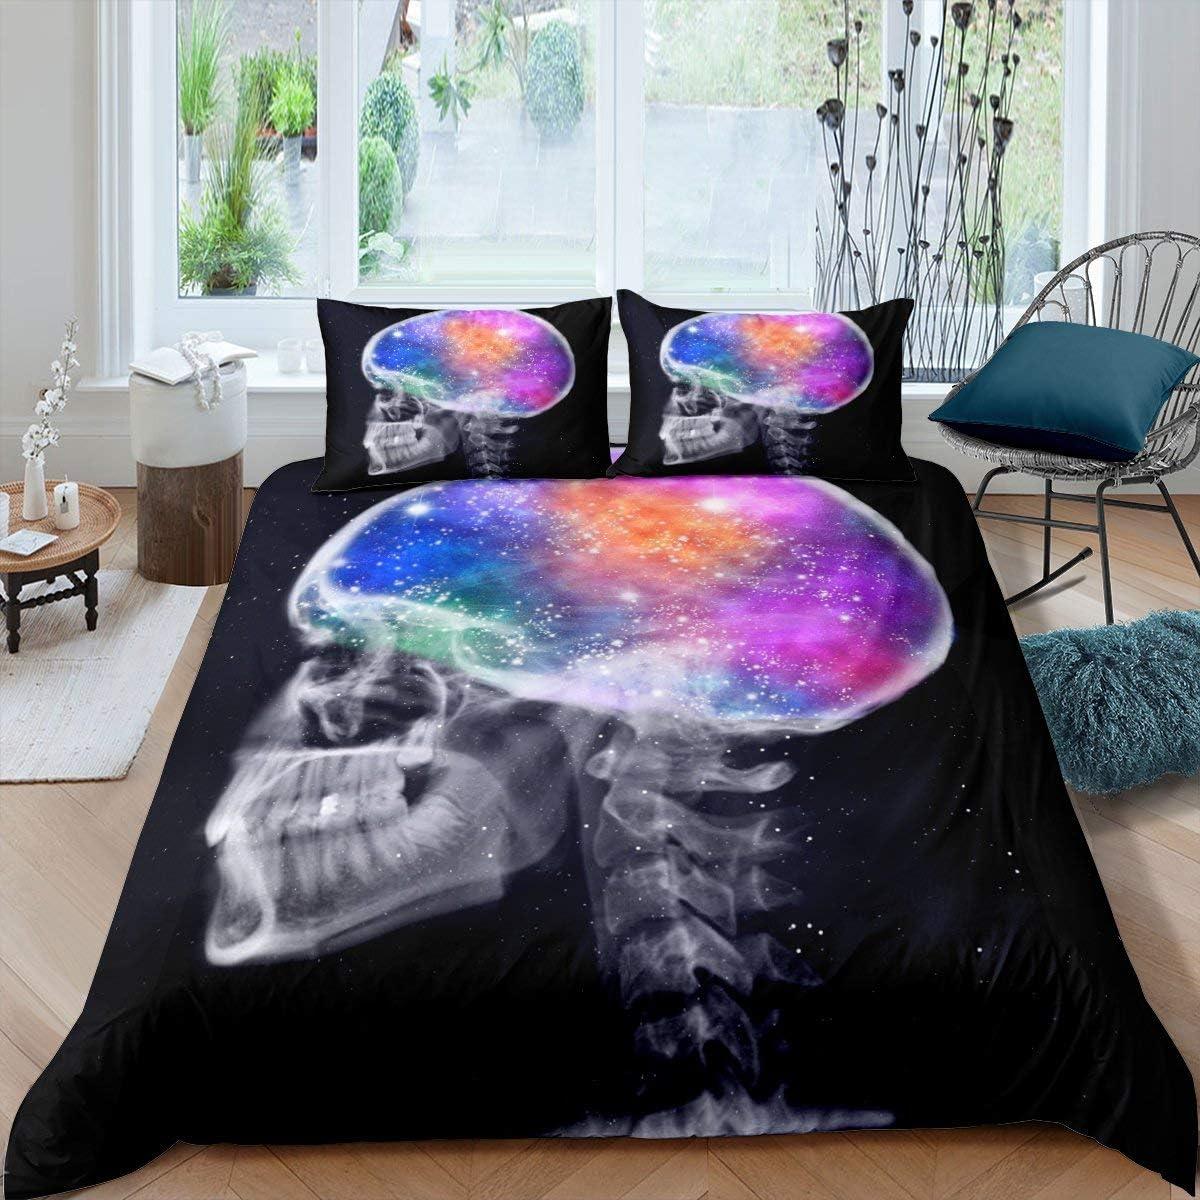 Erosebridal Sugar Skull Bedding Set, Rainbow Head Smoke Starlight Mystical Gothic Skeleton Comforter Cover, Decorative 2 Piece Duvet Cover with 1 Pillow Sham, Twin Size, Green Blue Purple Orange